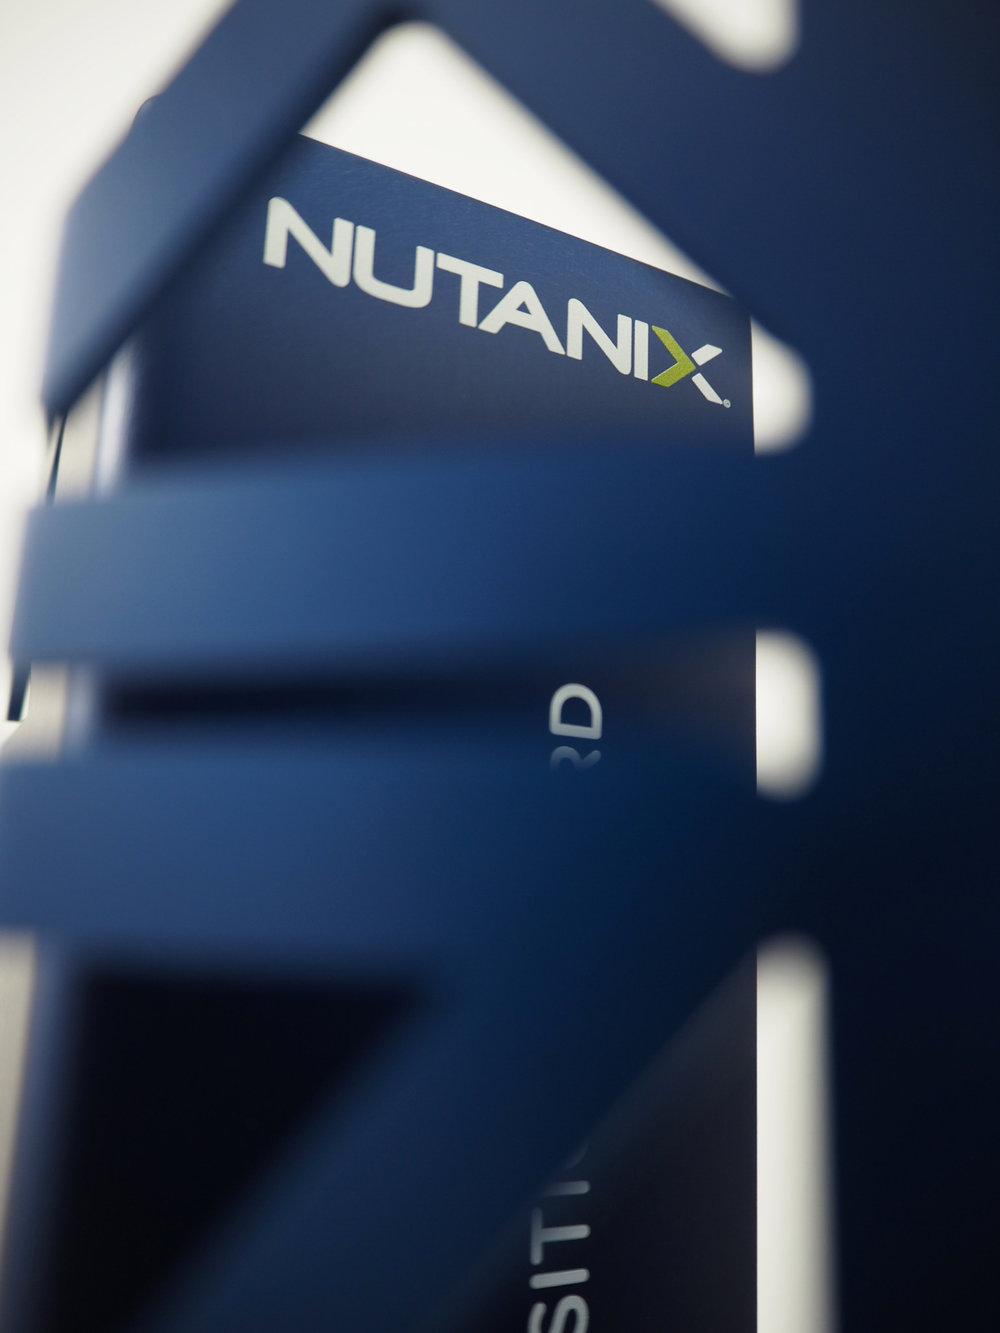 Nutanix-eco-aluminium-trophy-award-05.jpg